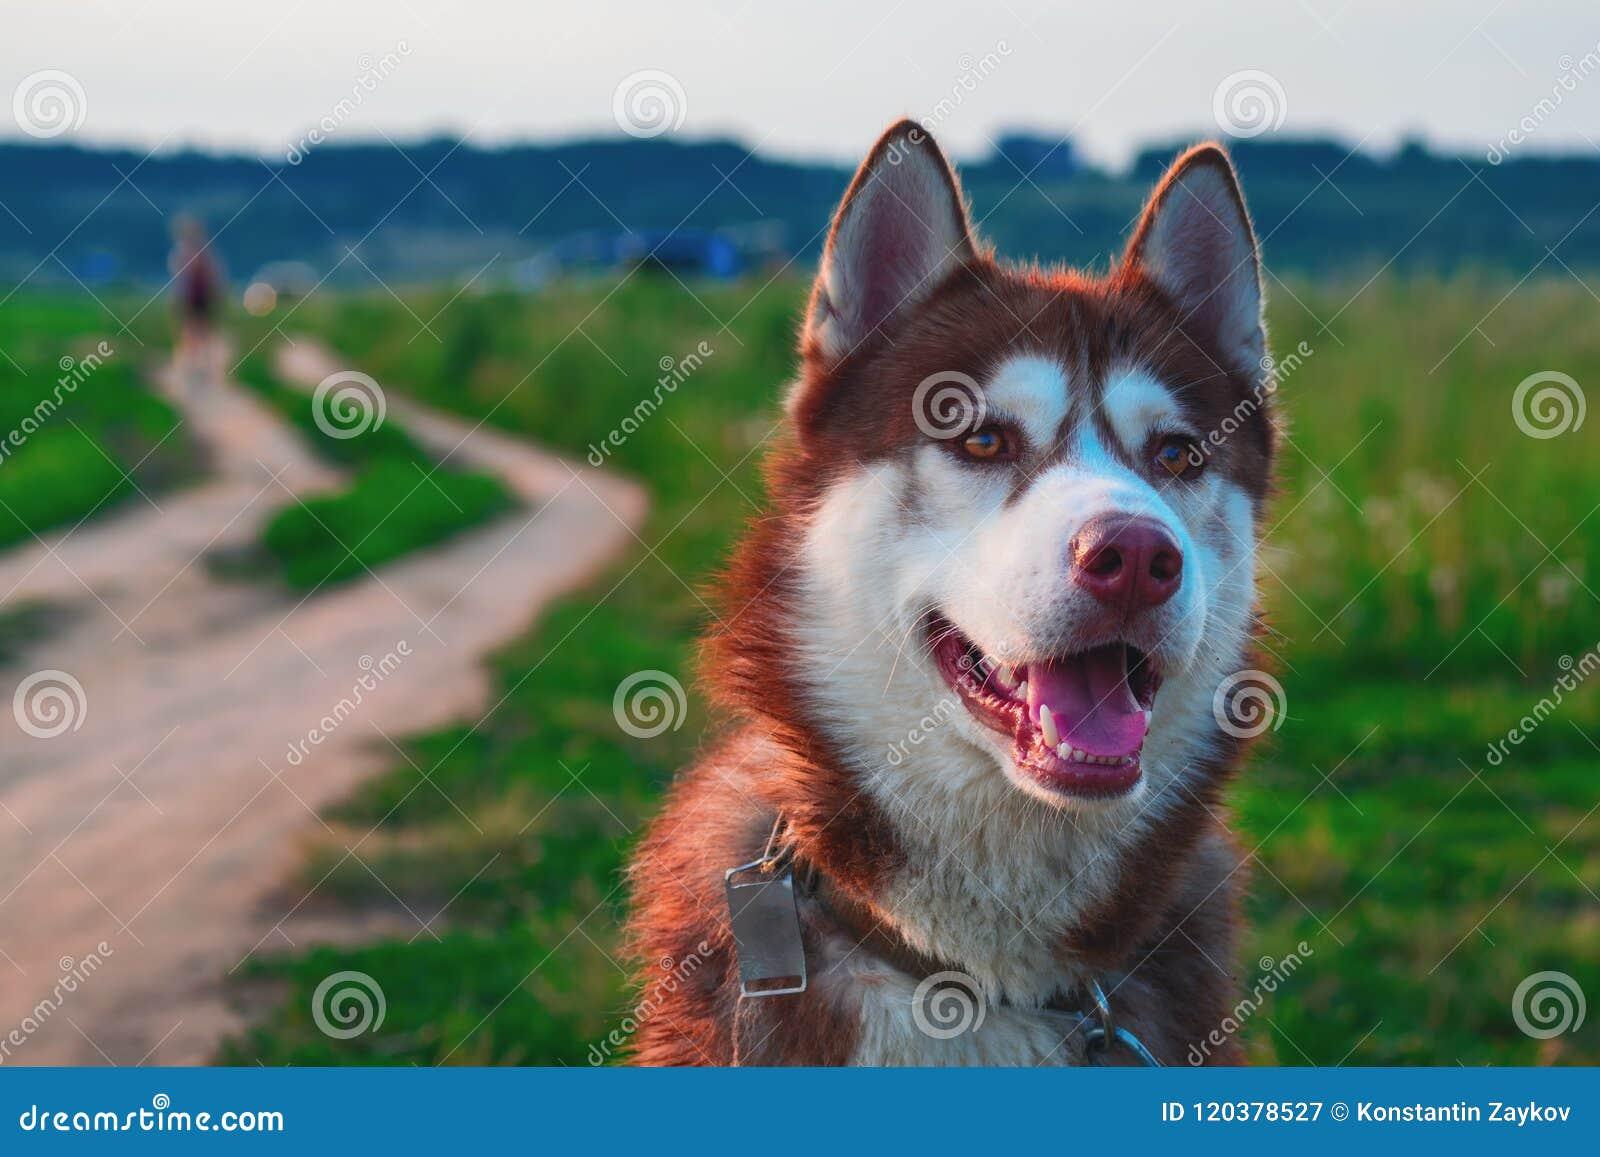 Portrait beautiful dog in nature landscape.